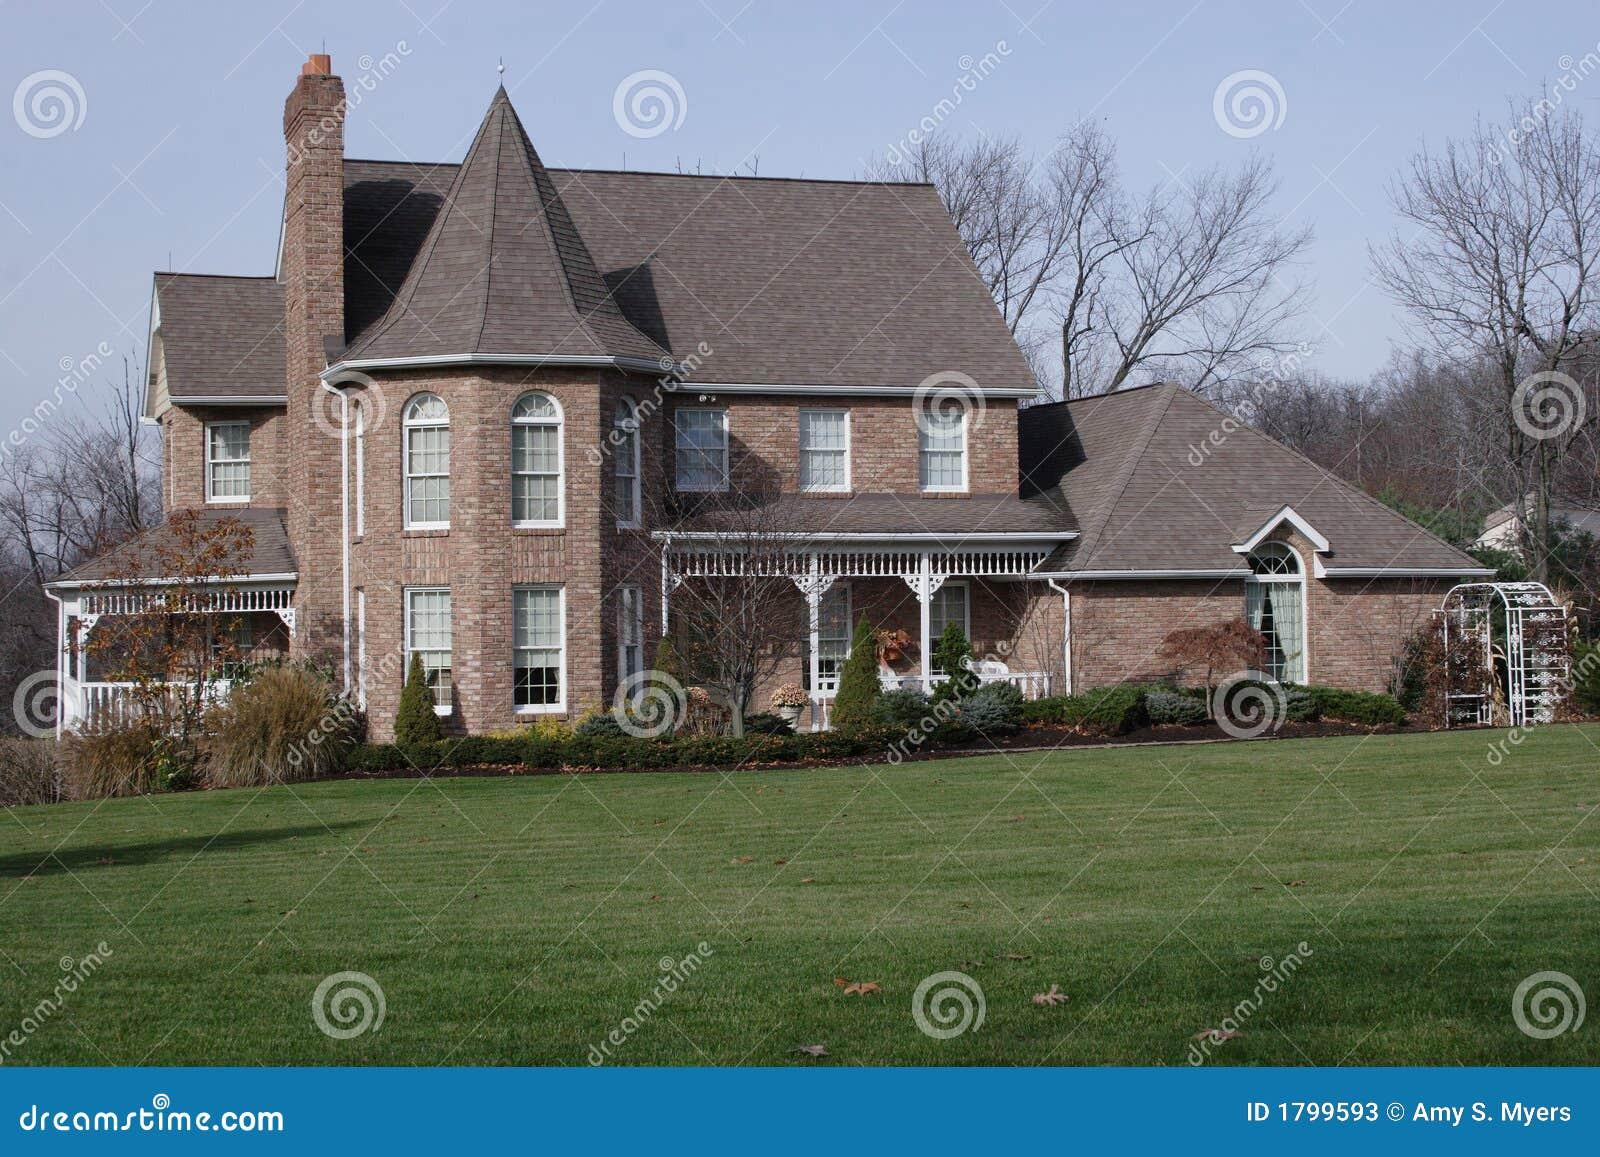 New House Victorian Brick